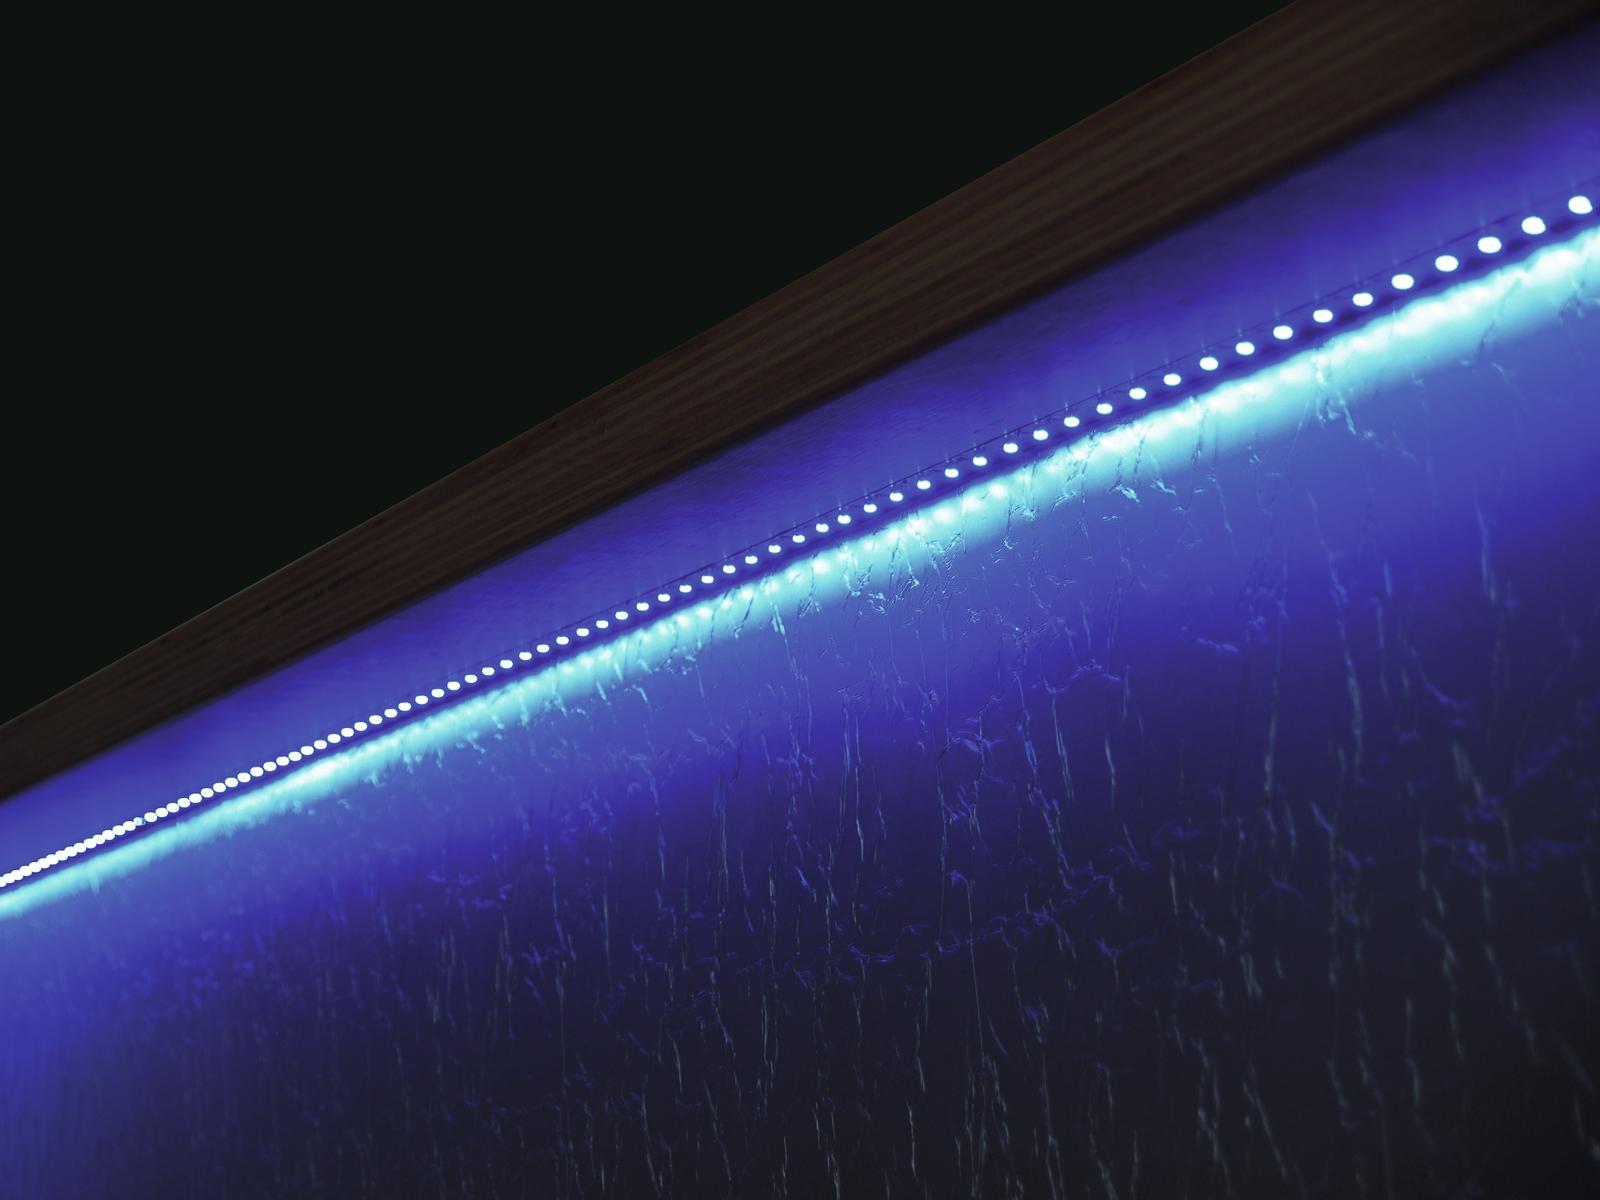 EUROLITE LED Striscia 300 5m 3528 blu 12V